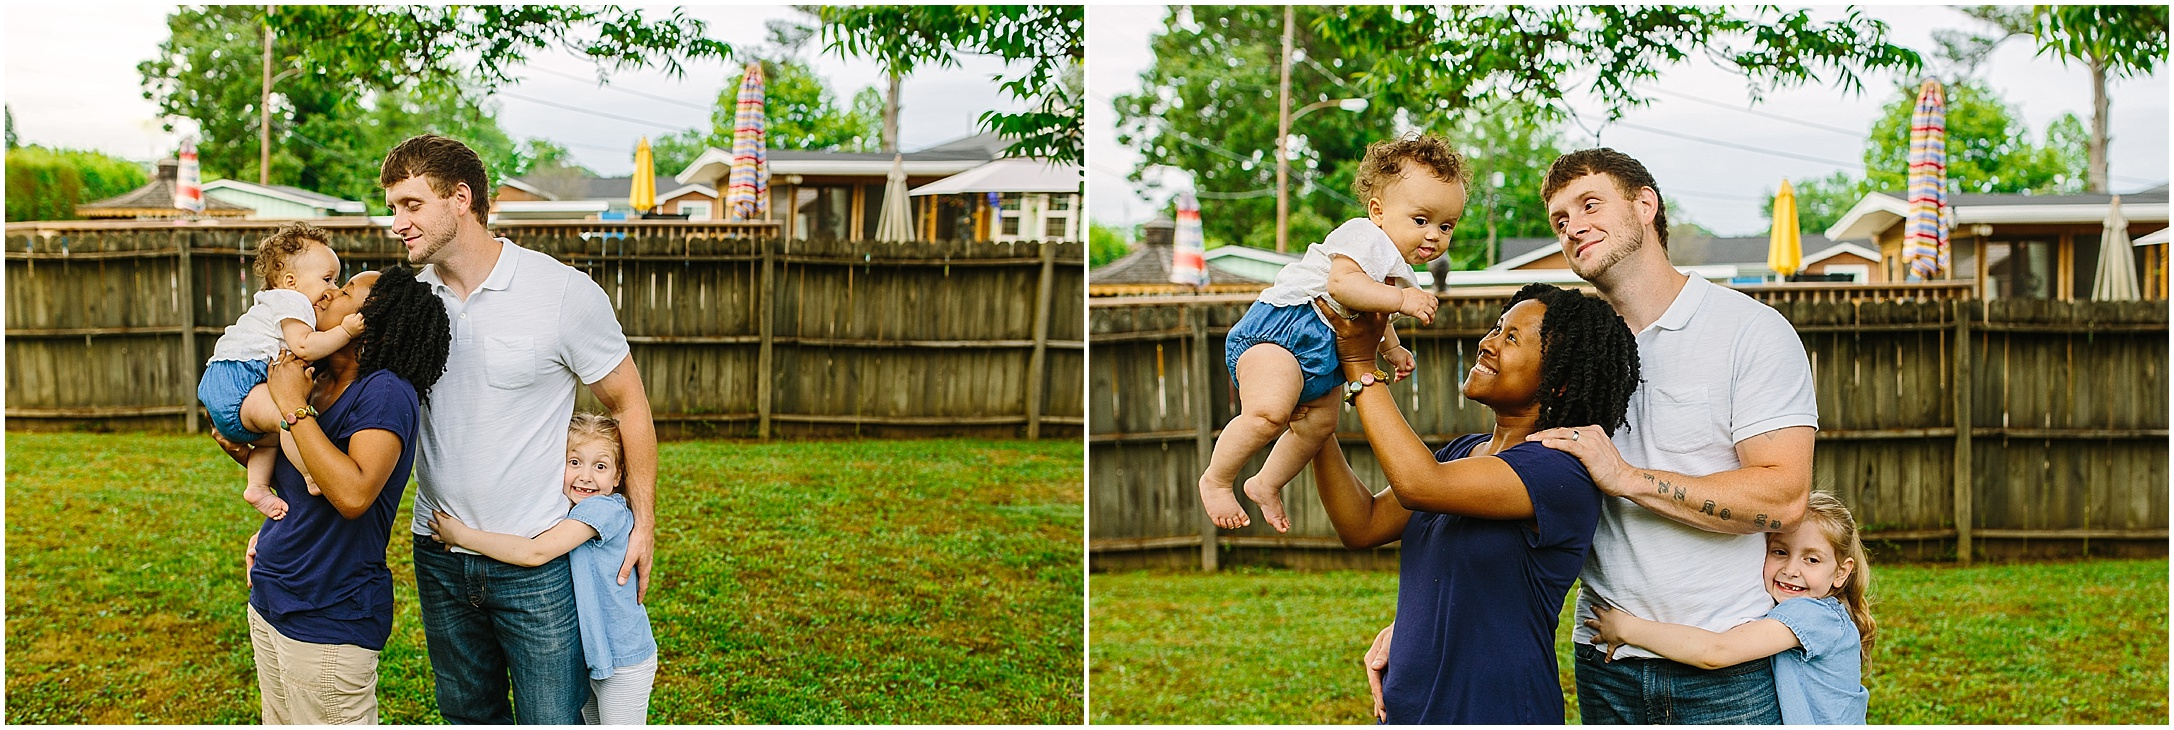 Family Documentary Photography by Emily Lapish Photography, Chattanooga, TN